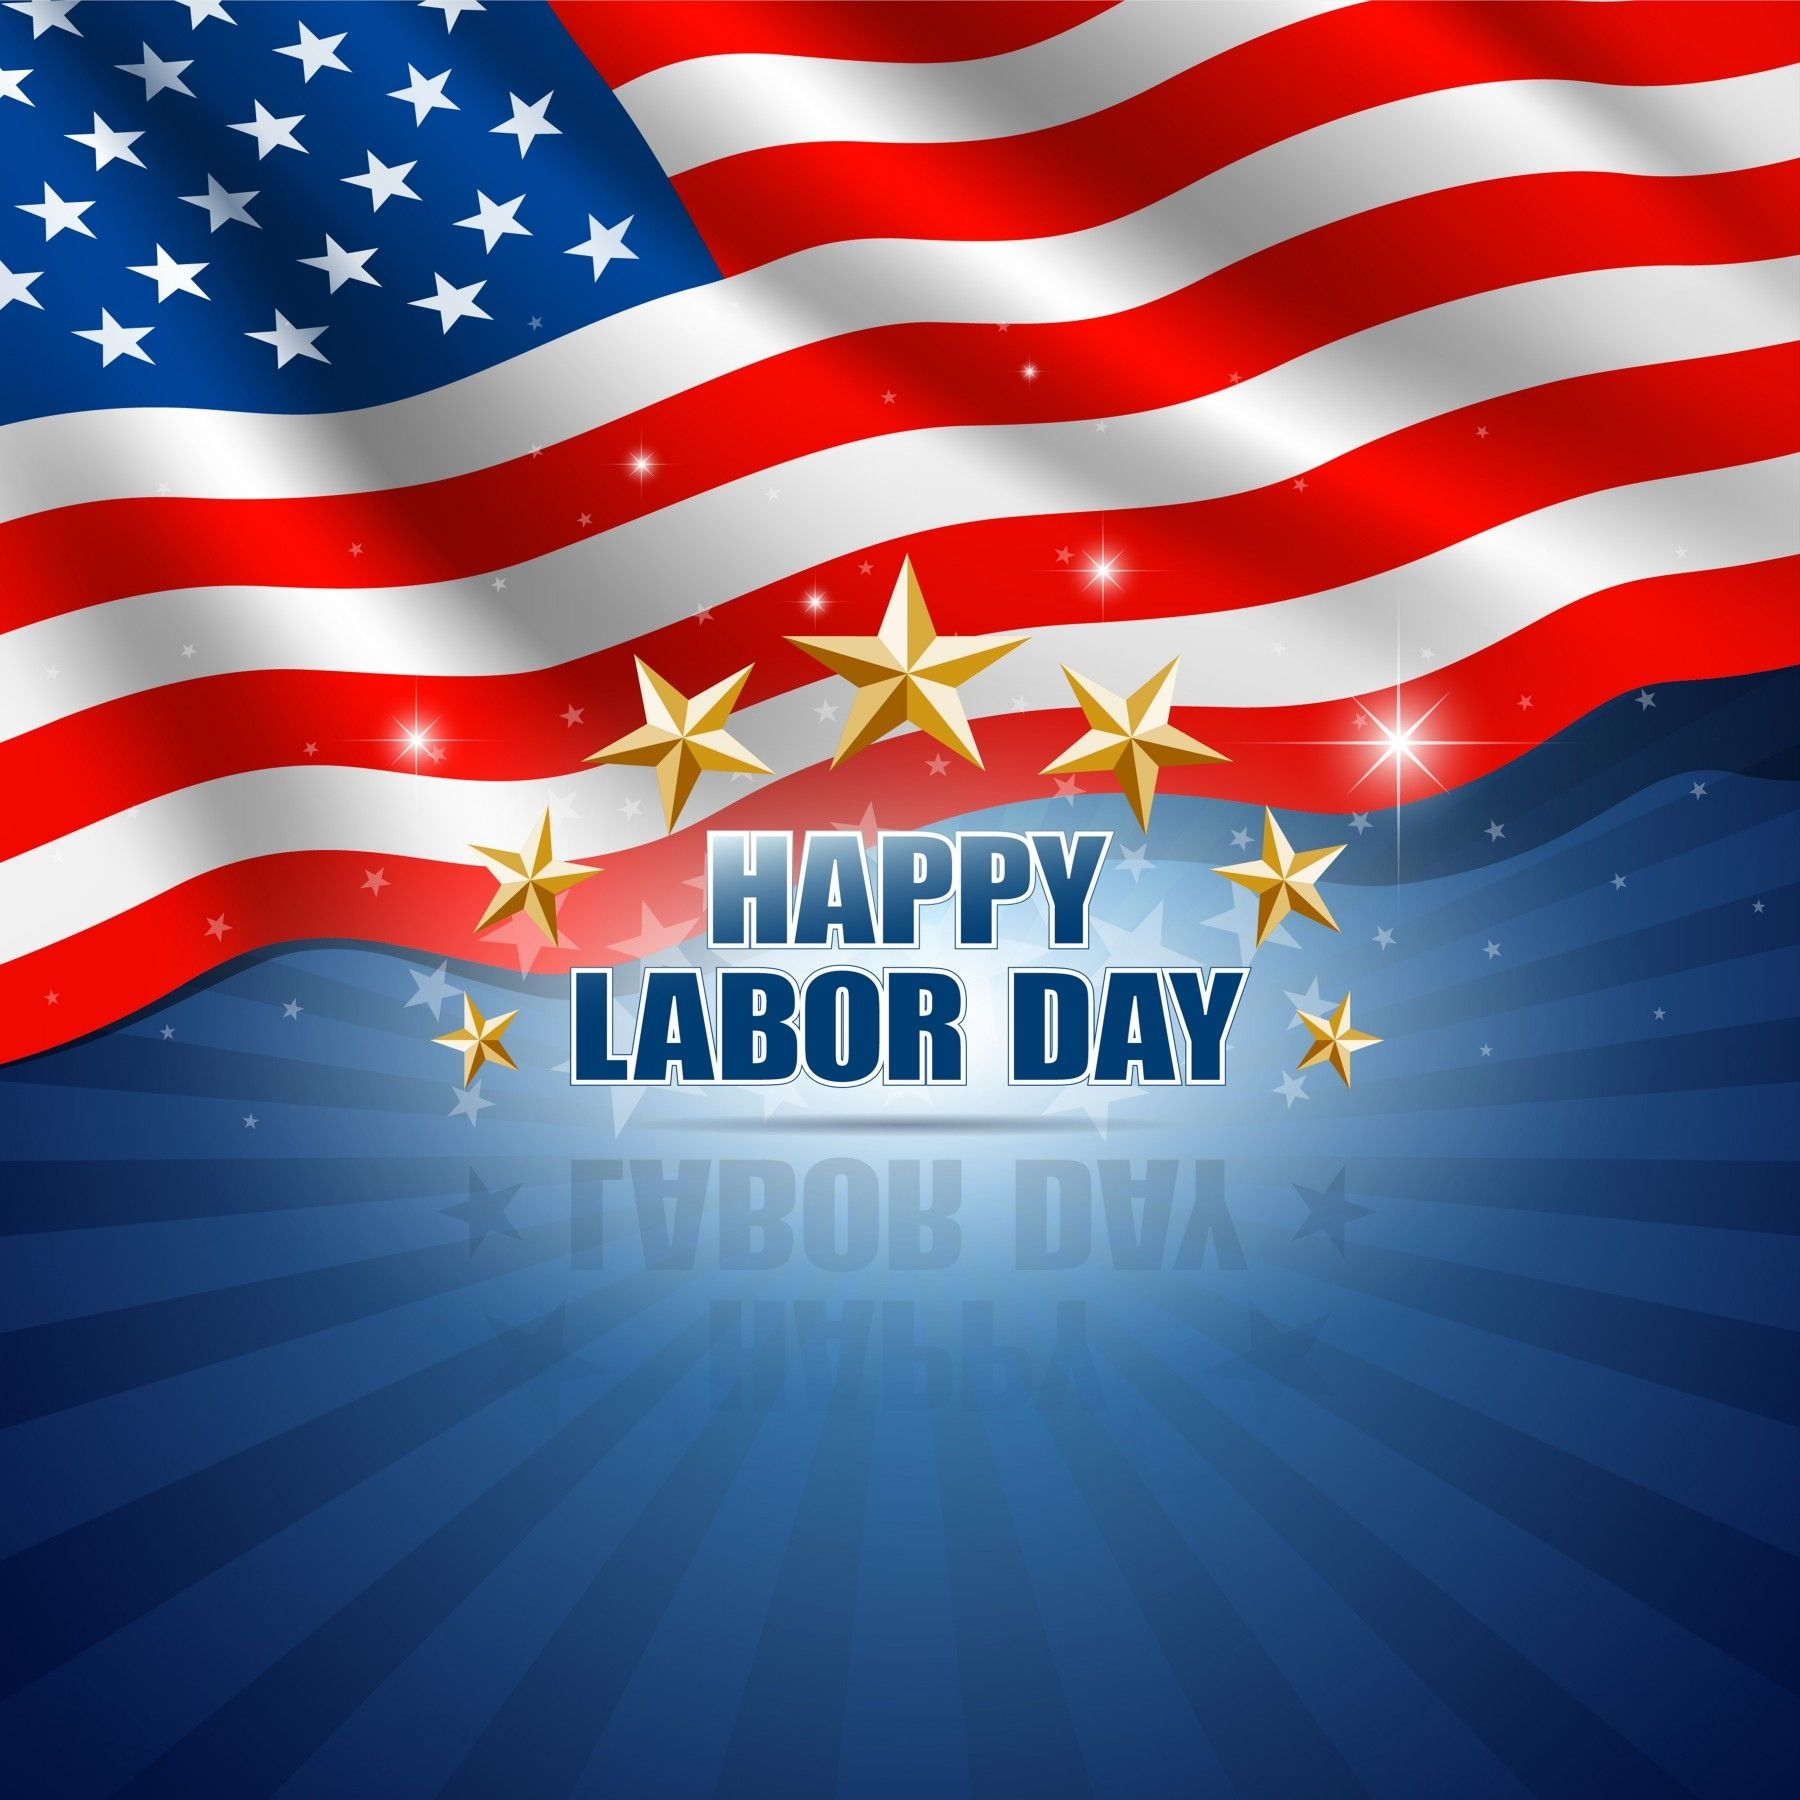 Happy Labor Day Usa Flag Holiday Labor Day Happy Labor Day Labor Day Quotes Labor Day Pictures Labour Day Wishes Labor Day Quotes